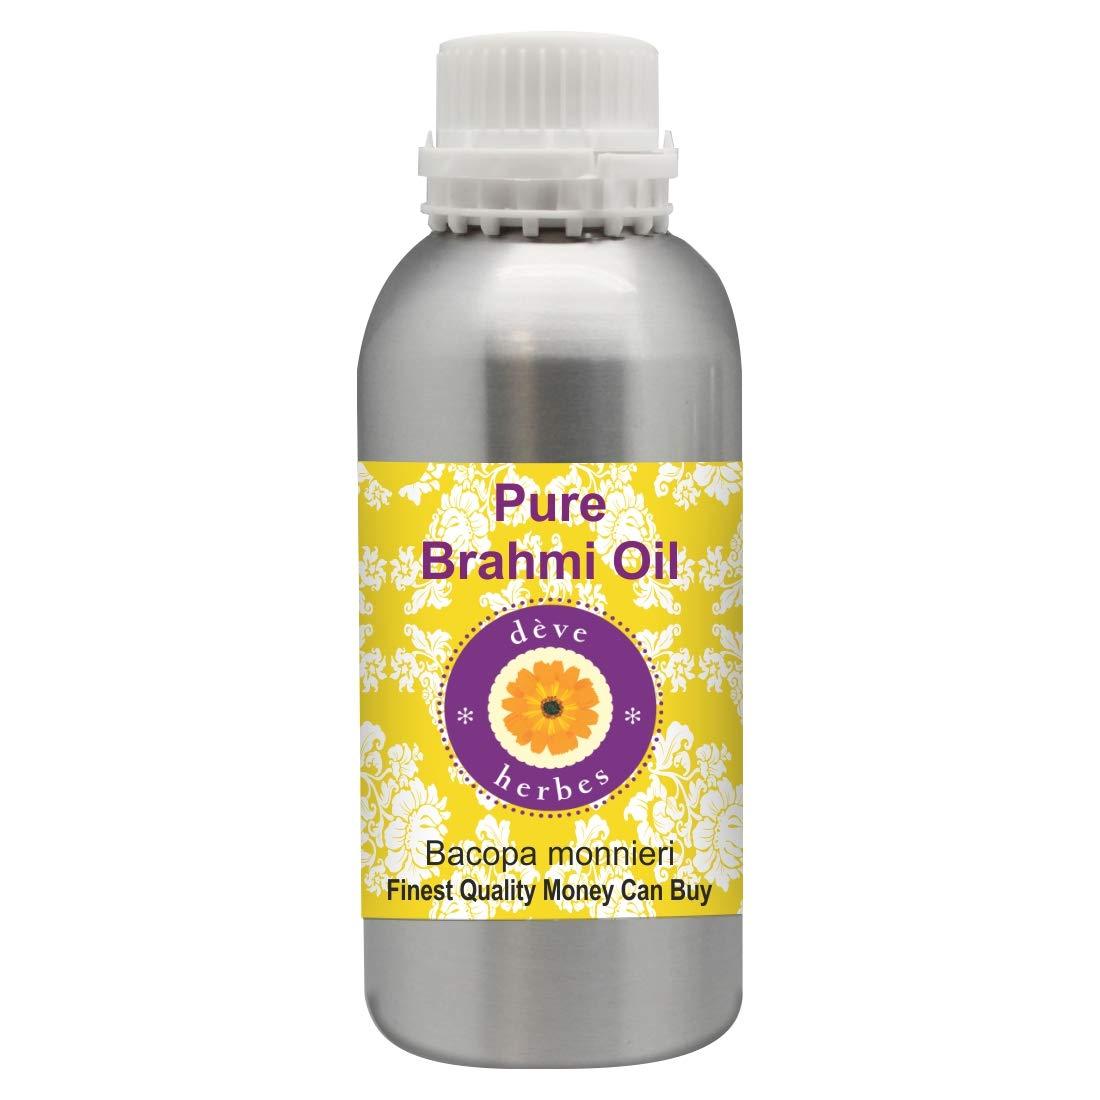 Deve Herbes Pure Brahmi Oil monnieri Premium Bacopa Therapeuti ディスカウント ブランド買うならブランドオフ